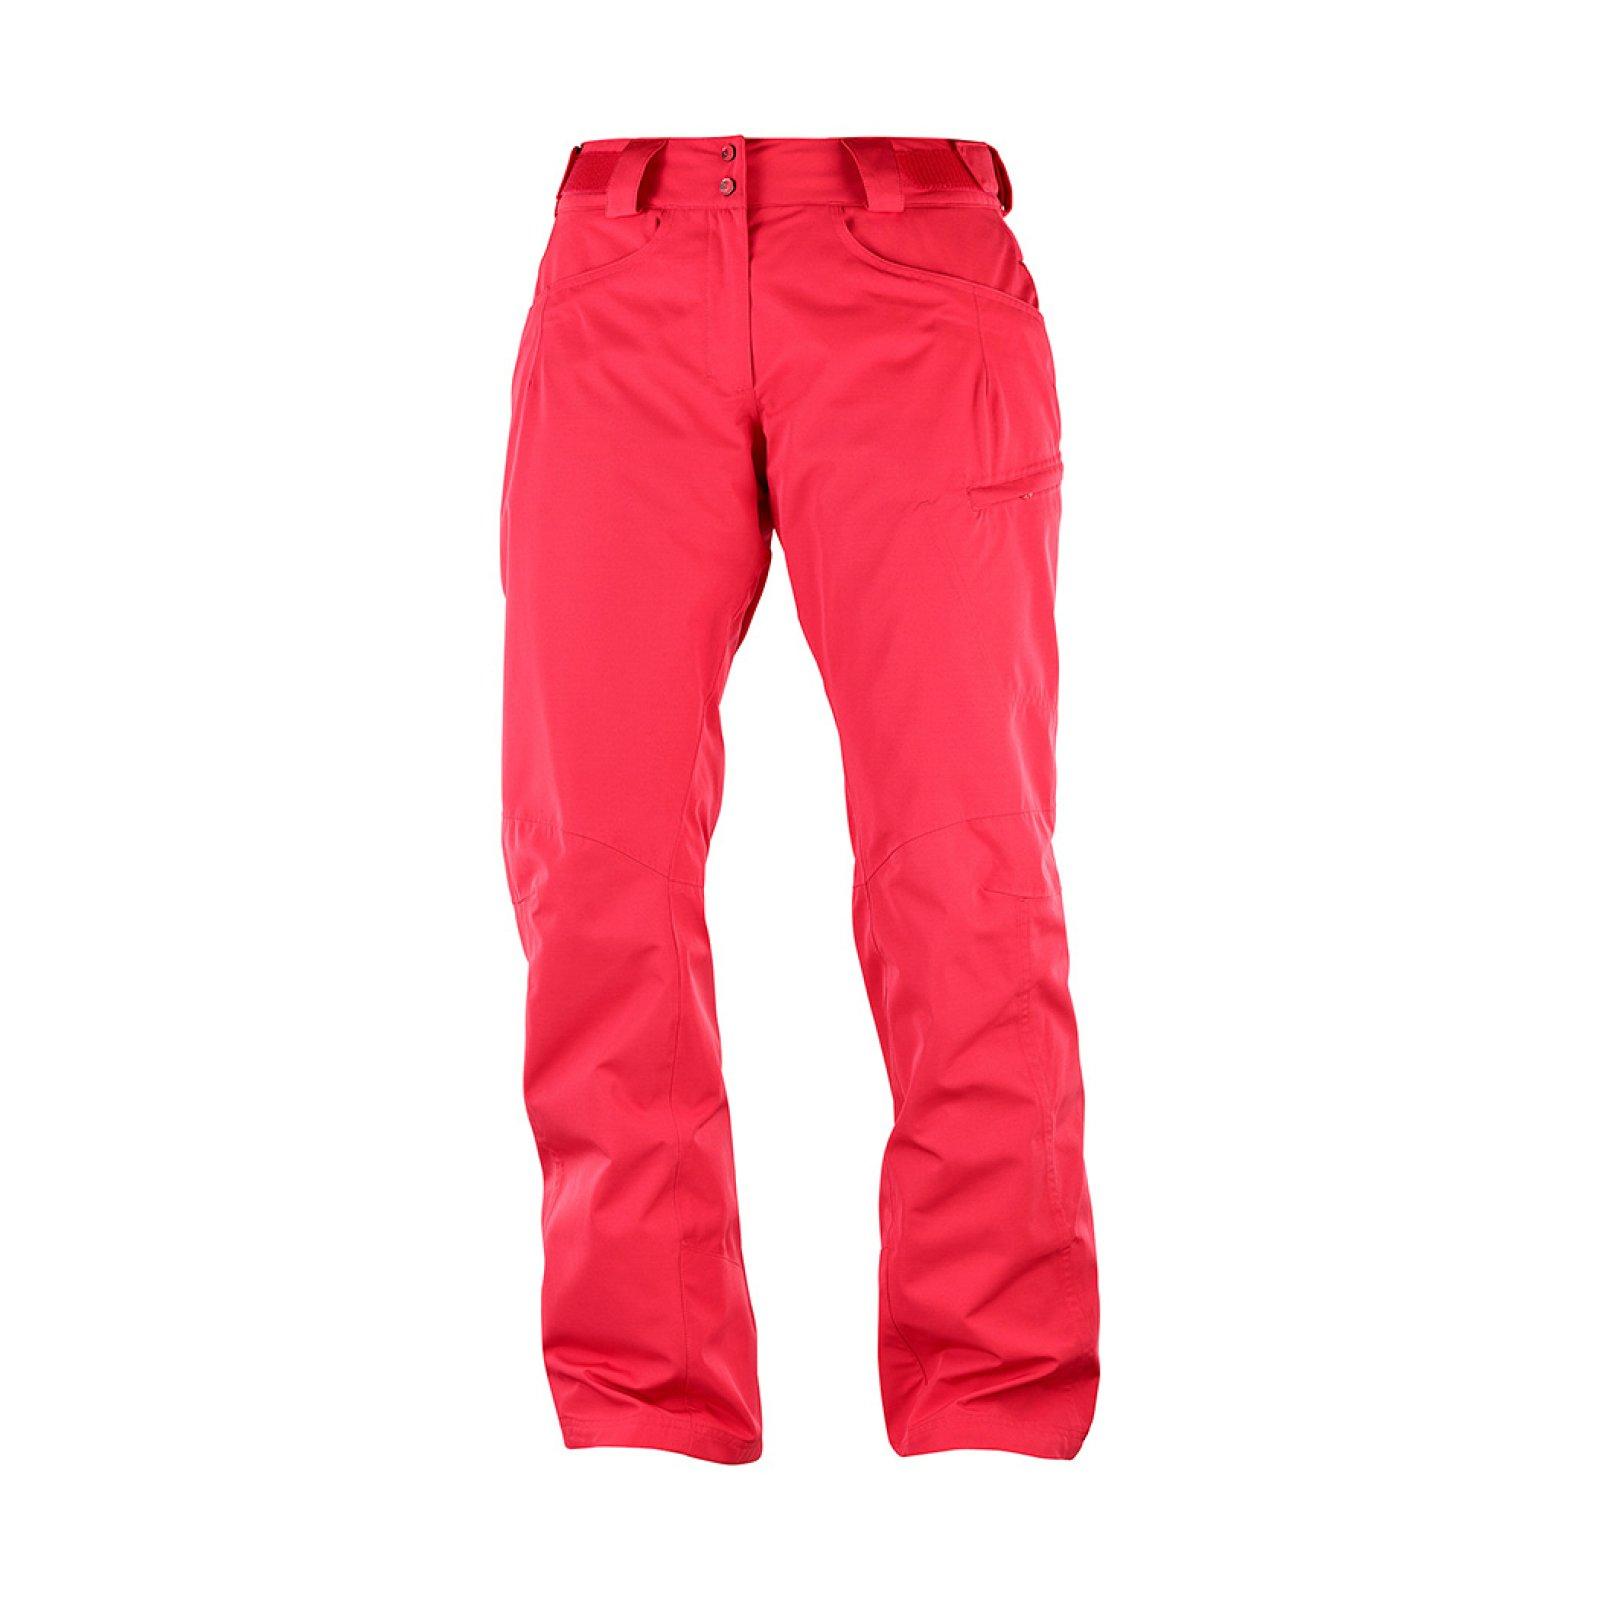 Lyžařské kalhoty Salomon Fantasy Pant W hibiscus heather L40367000 ... 610f90eb58